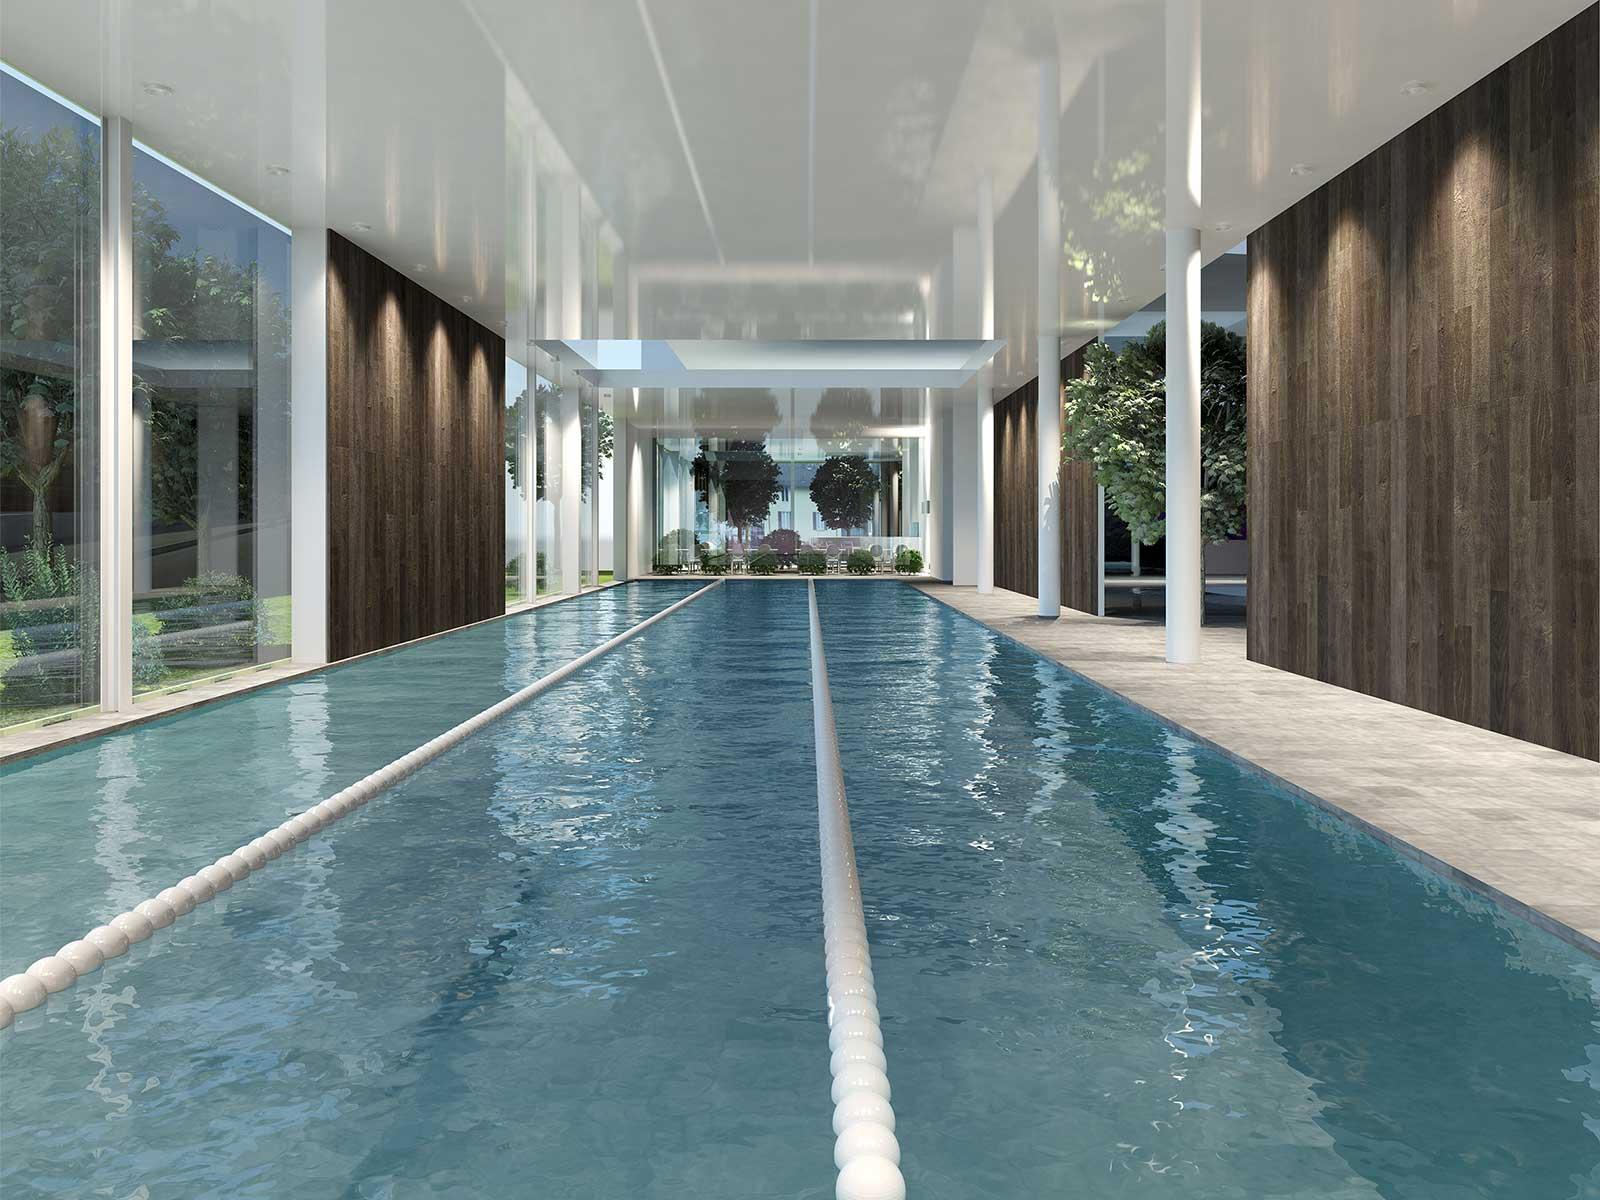 piscina nuoto e acquagym